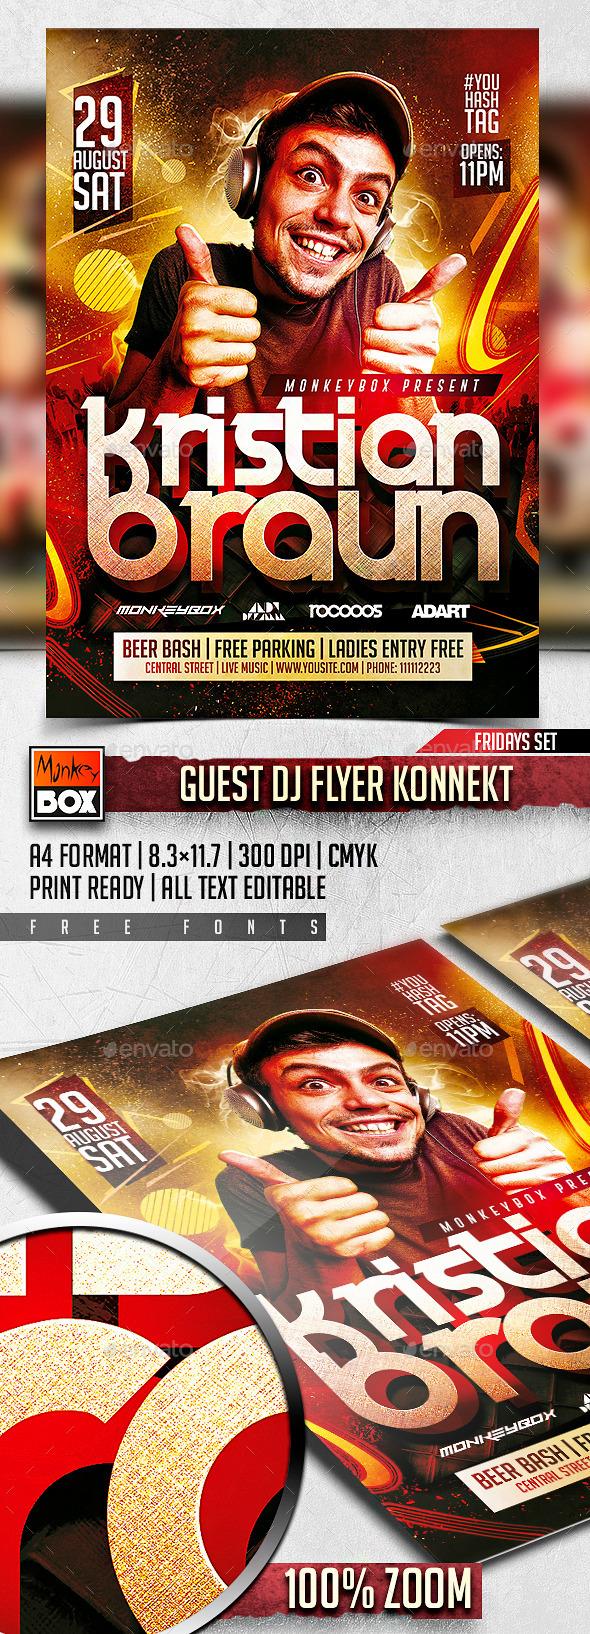 Guest Dj Flyer Konnekt - Clubs & Parties Events